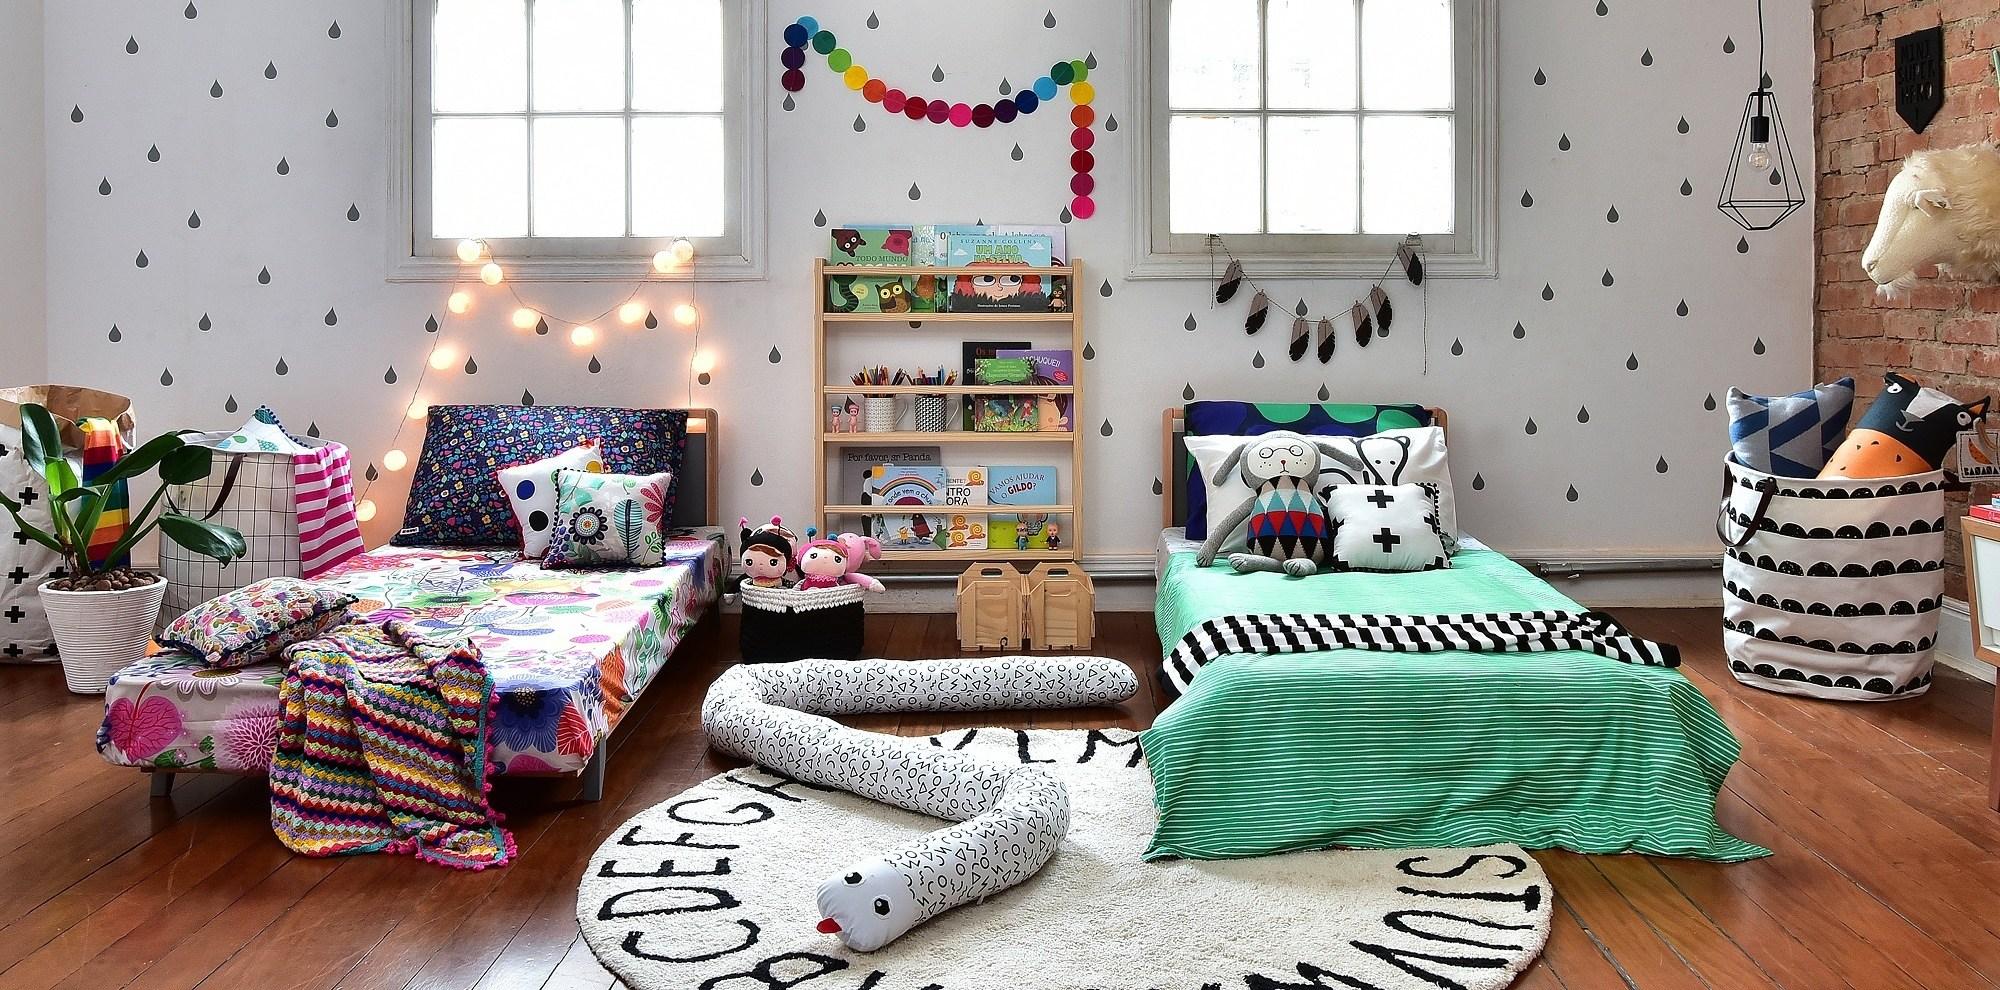 Roupas de cama coloridas Mooui.